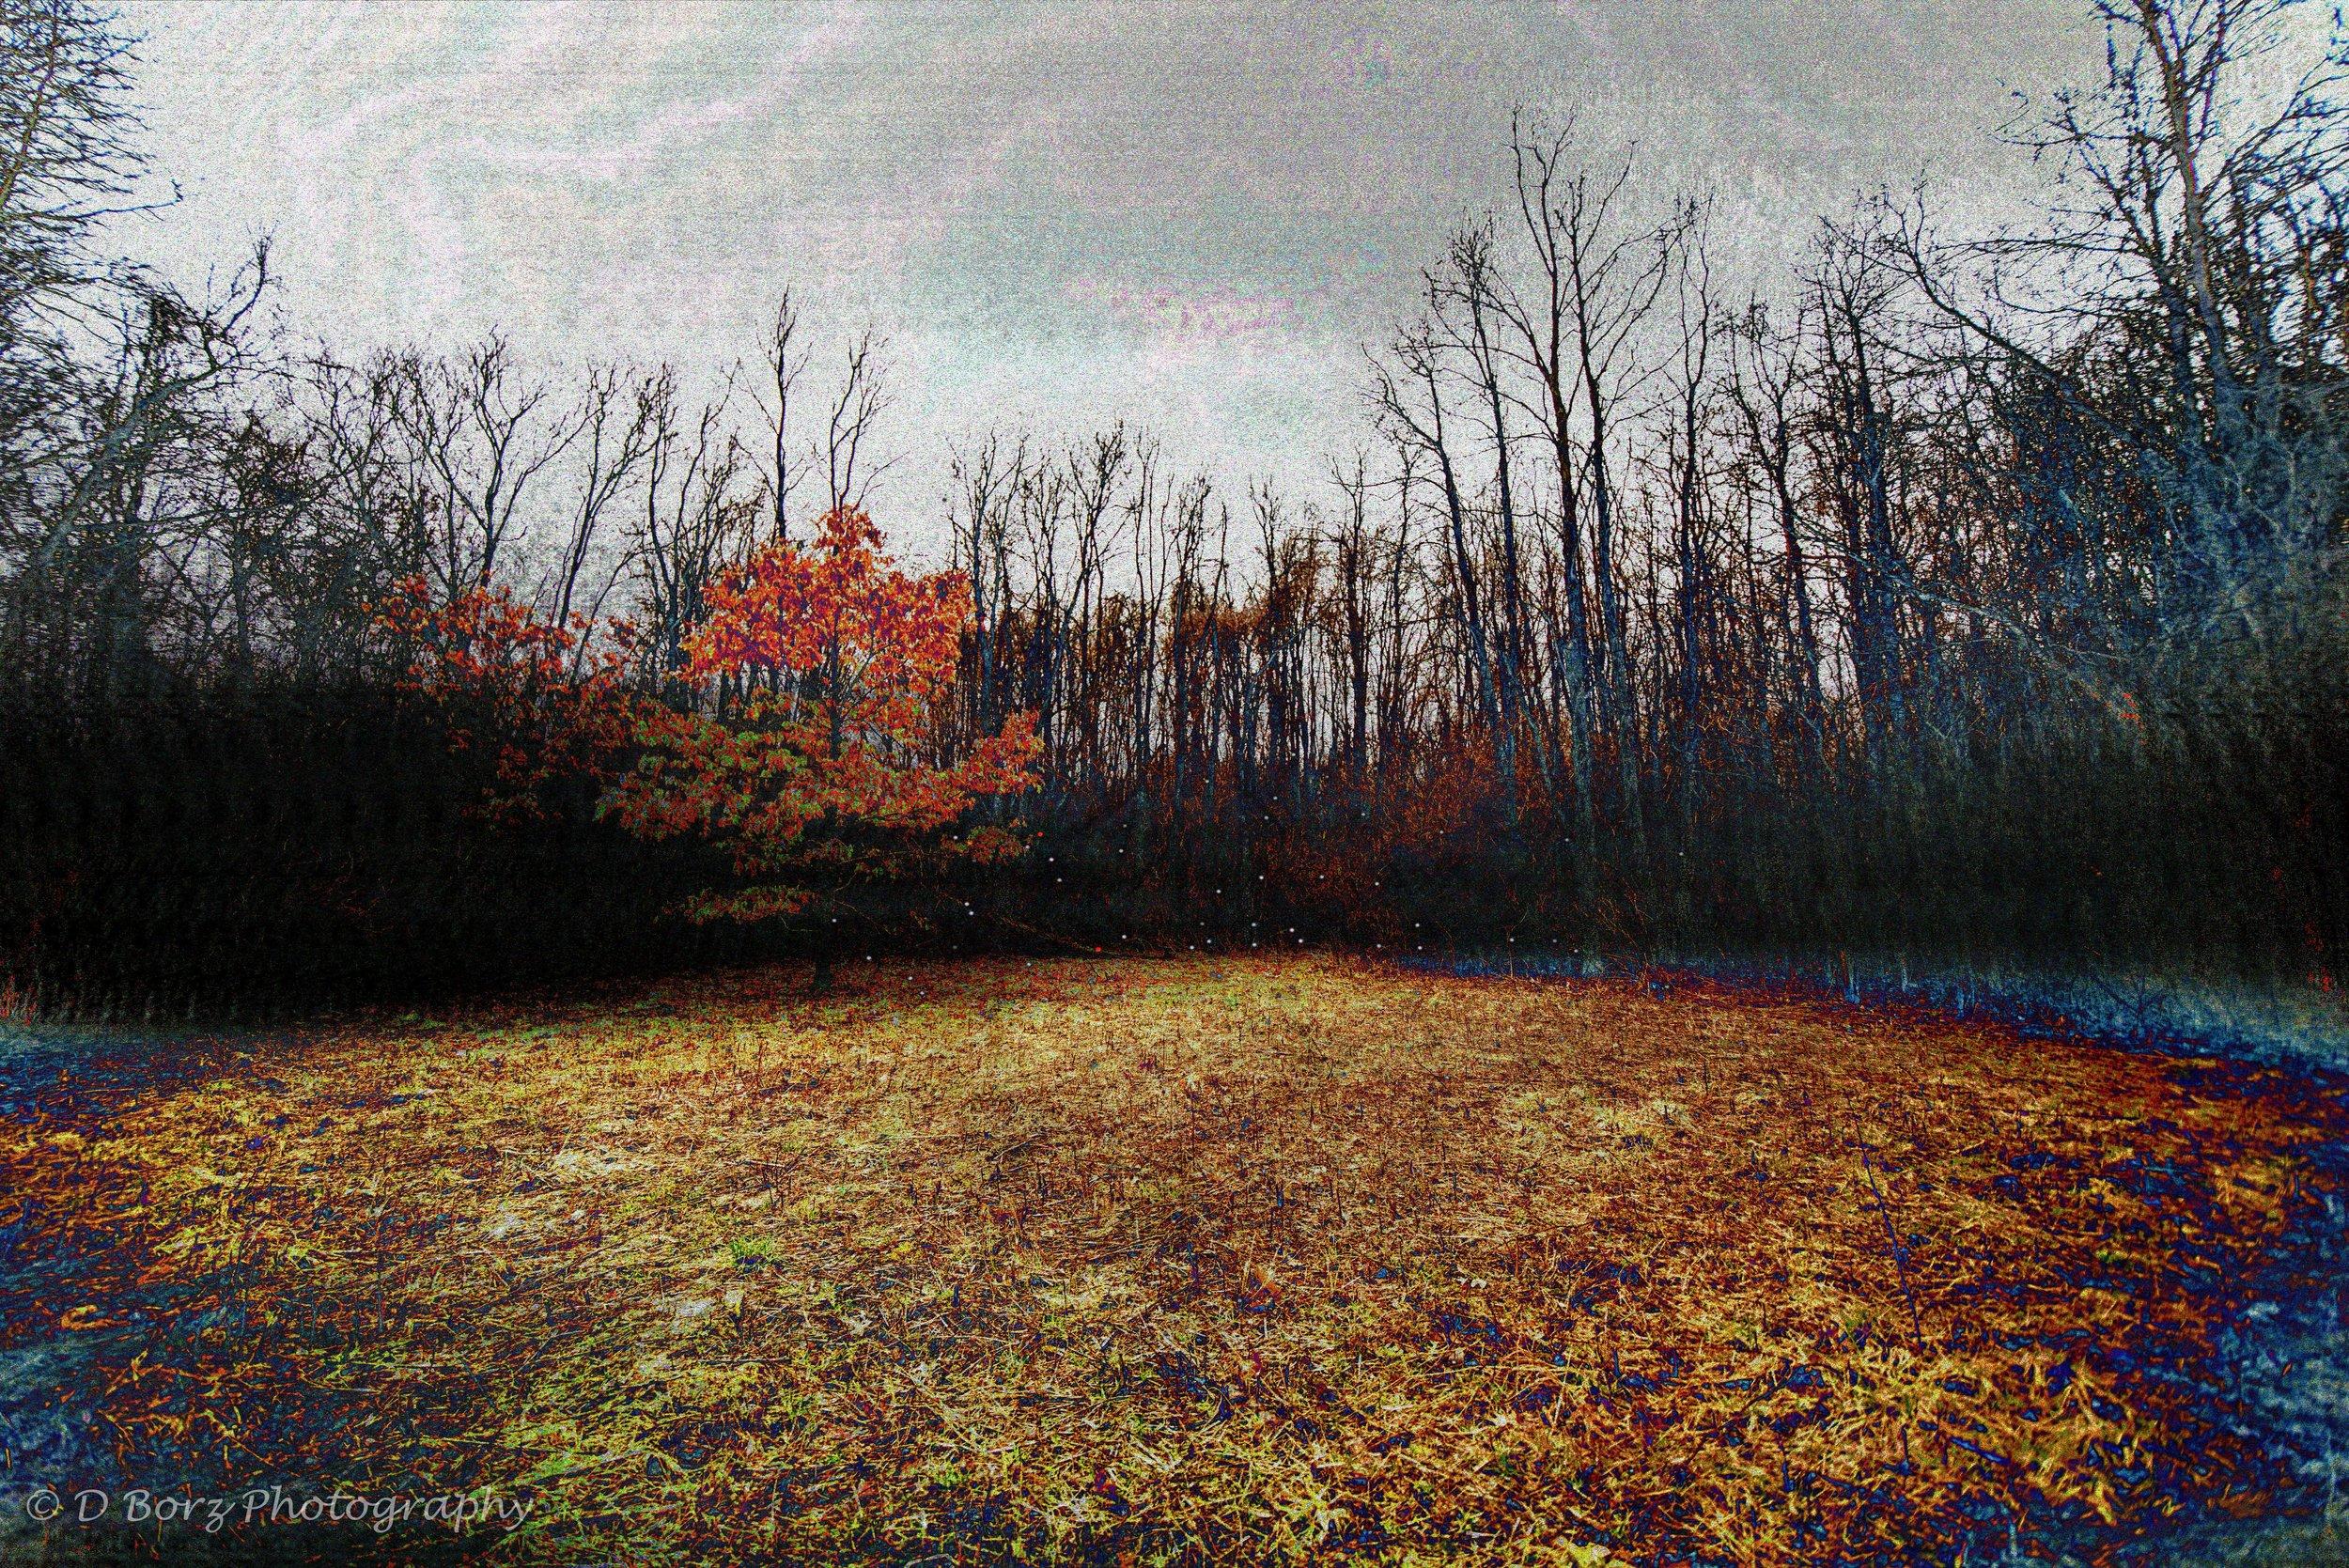 borzkowski_d_soundscape-22.jpg